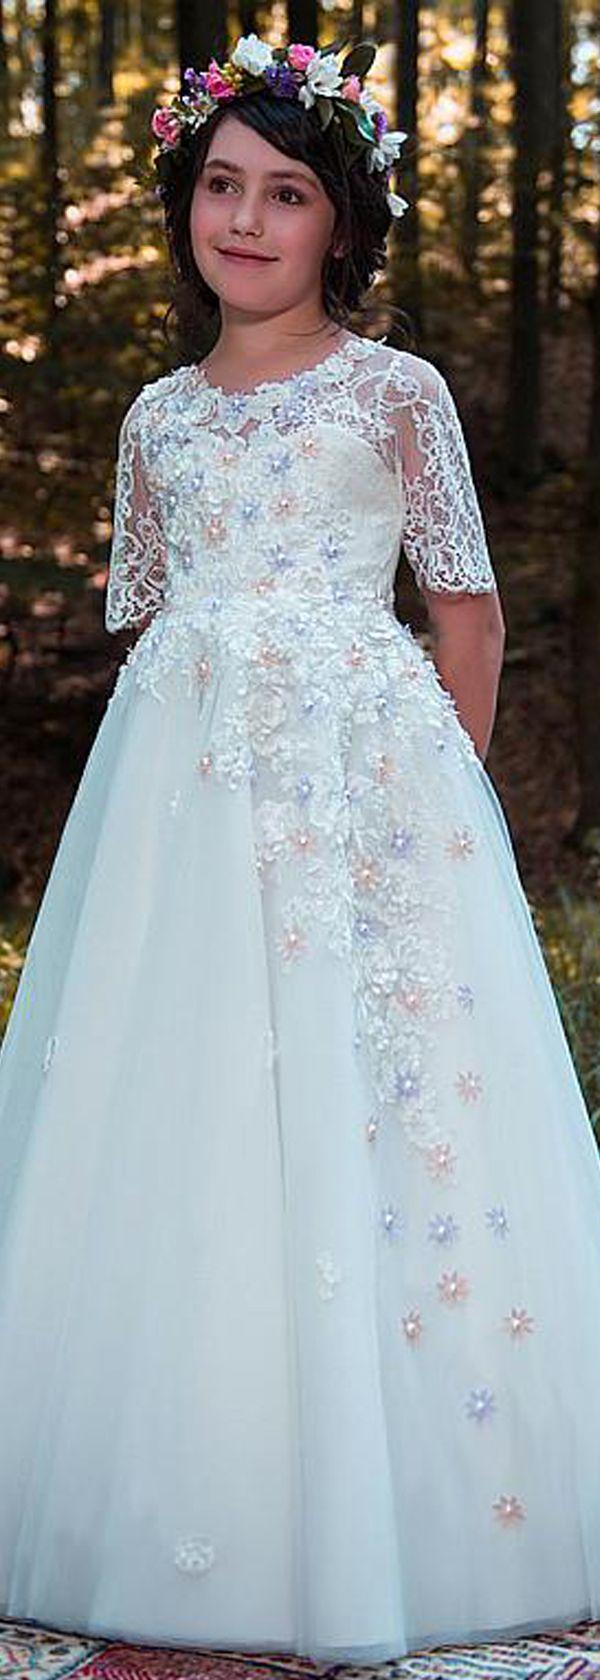 Teal and white wedding dresses  Popular Tulle u Lace Scoop Neckline Short Sleeves Aline Flower Girl